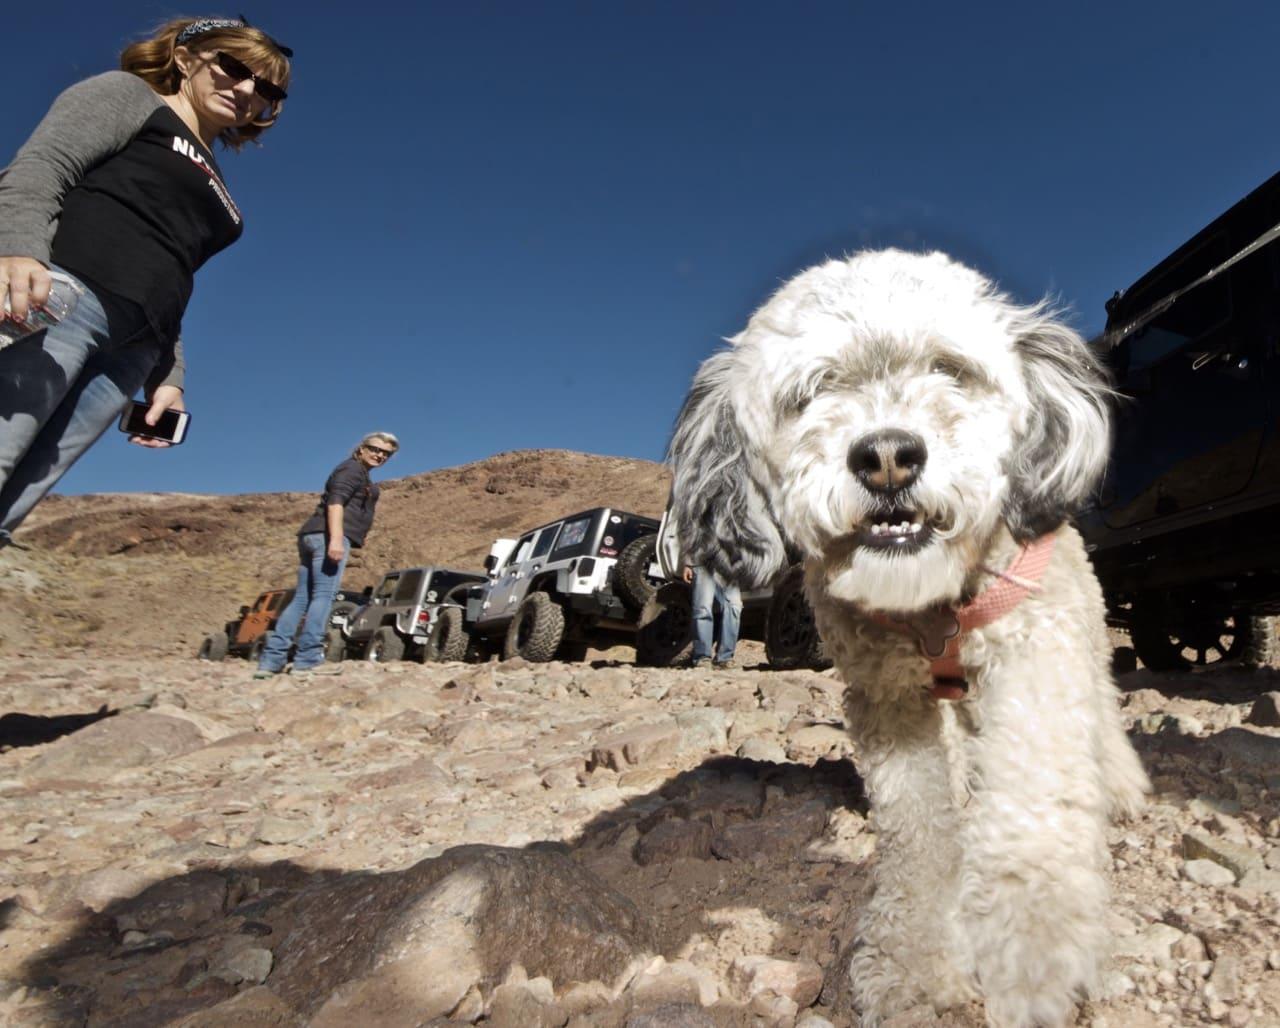 Jeep dog!